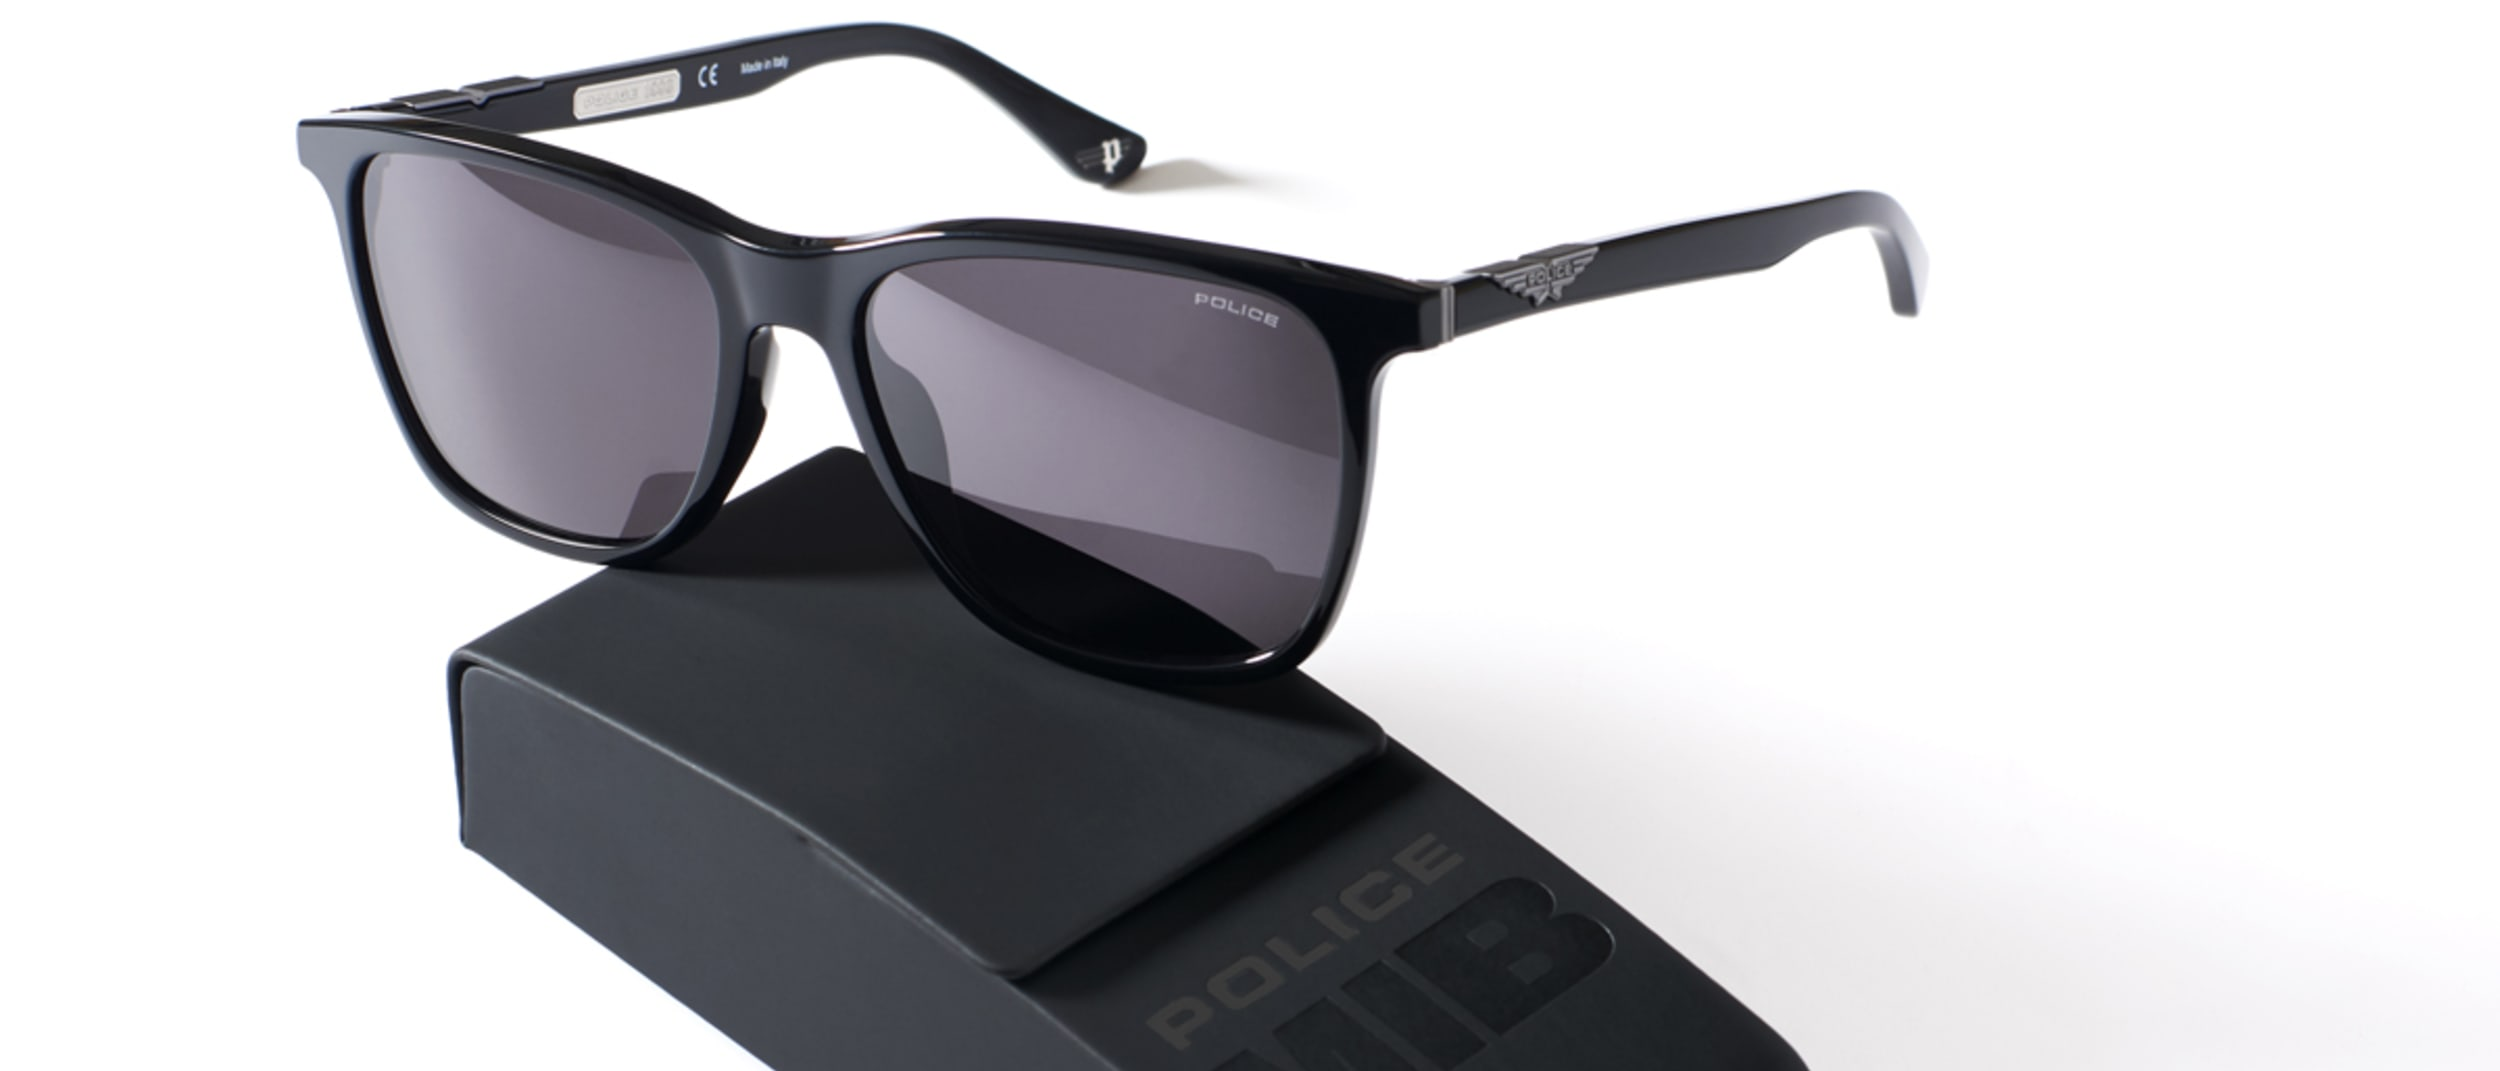 Exclusive Men in Black sunglasses in store now